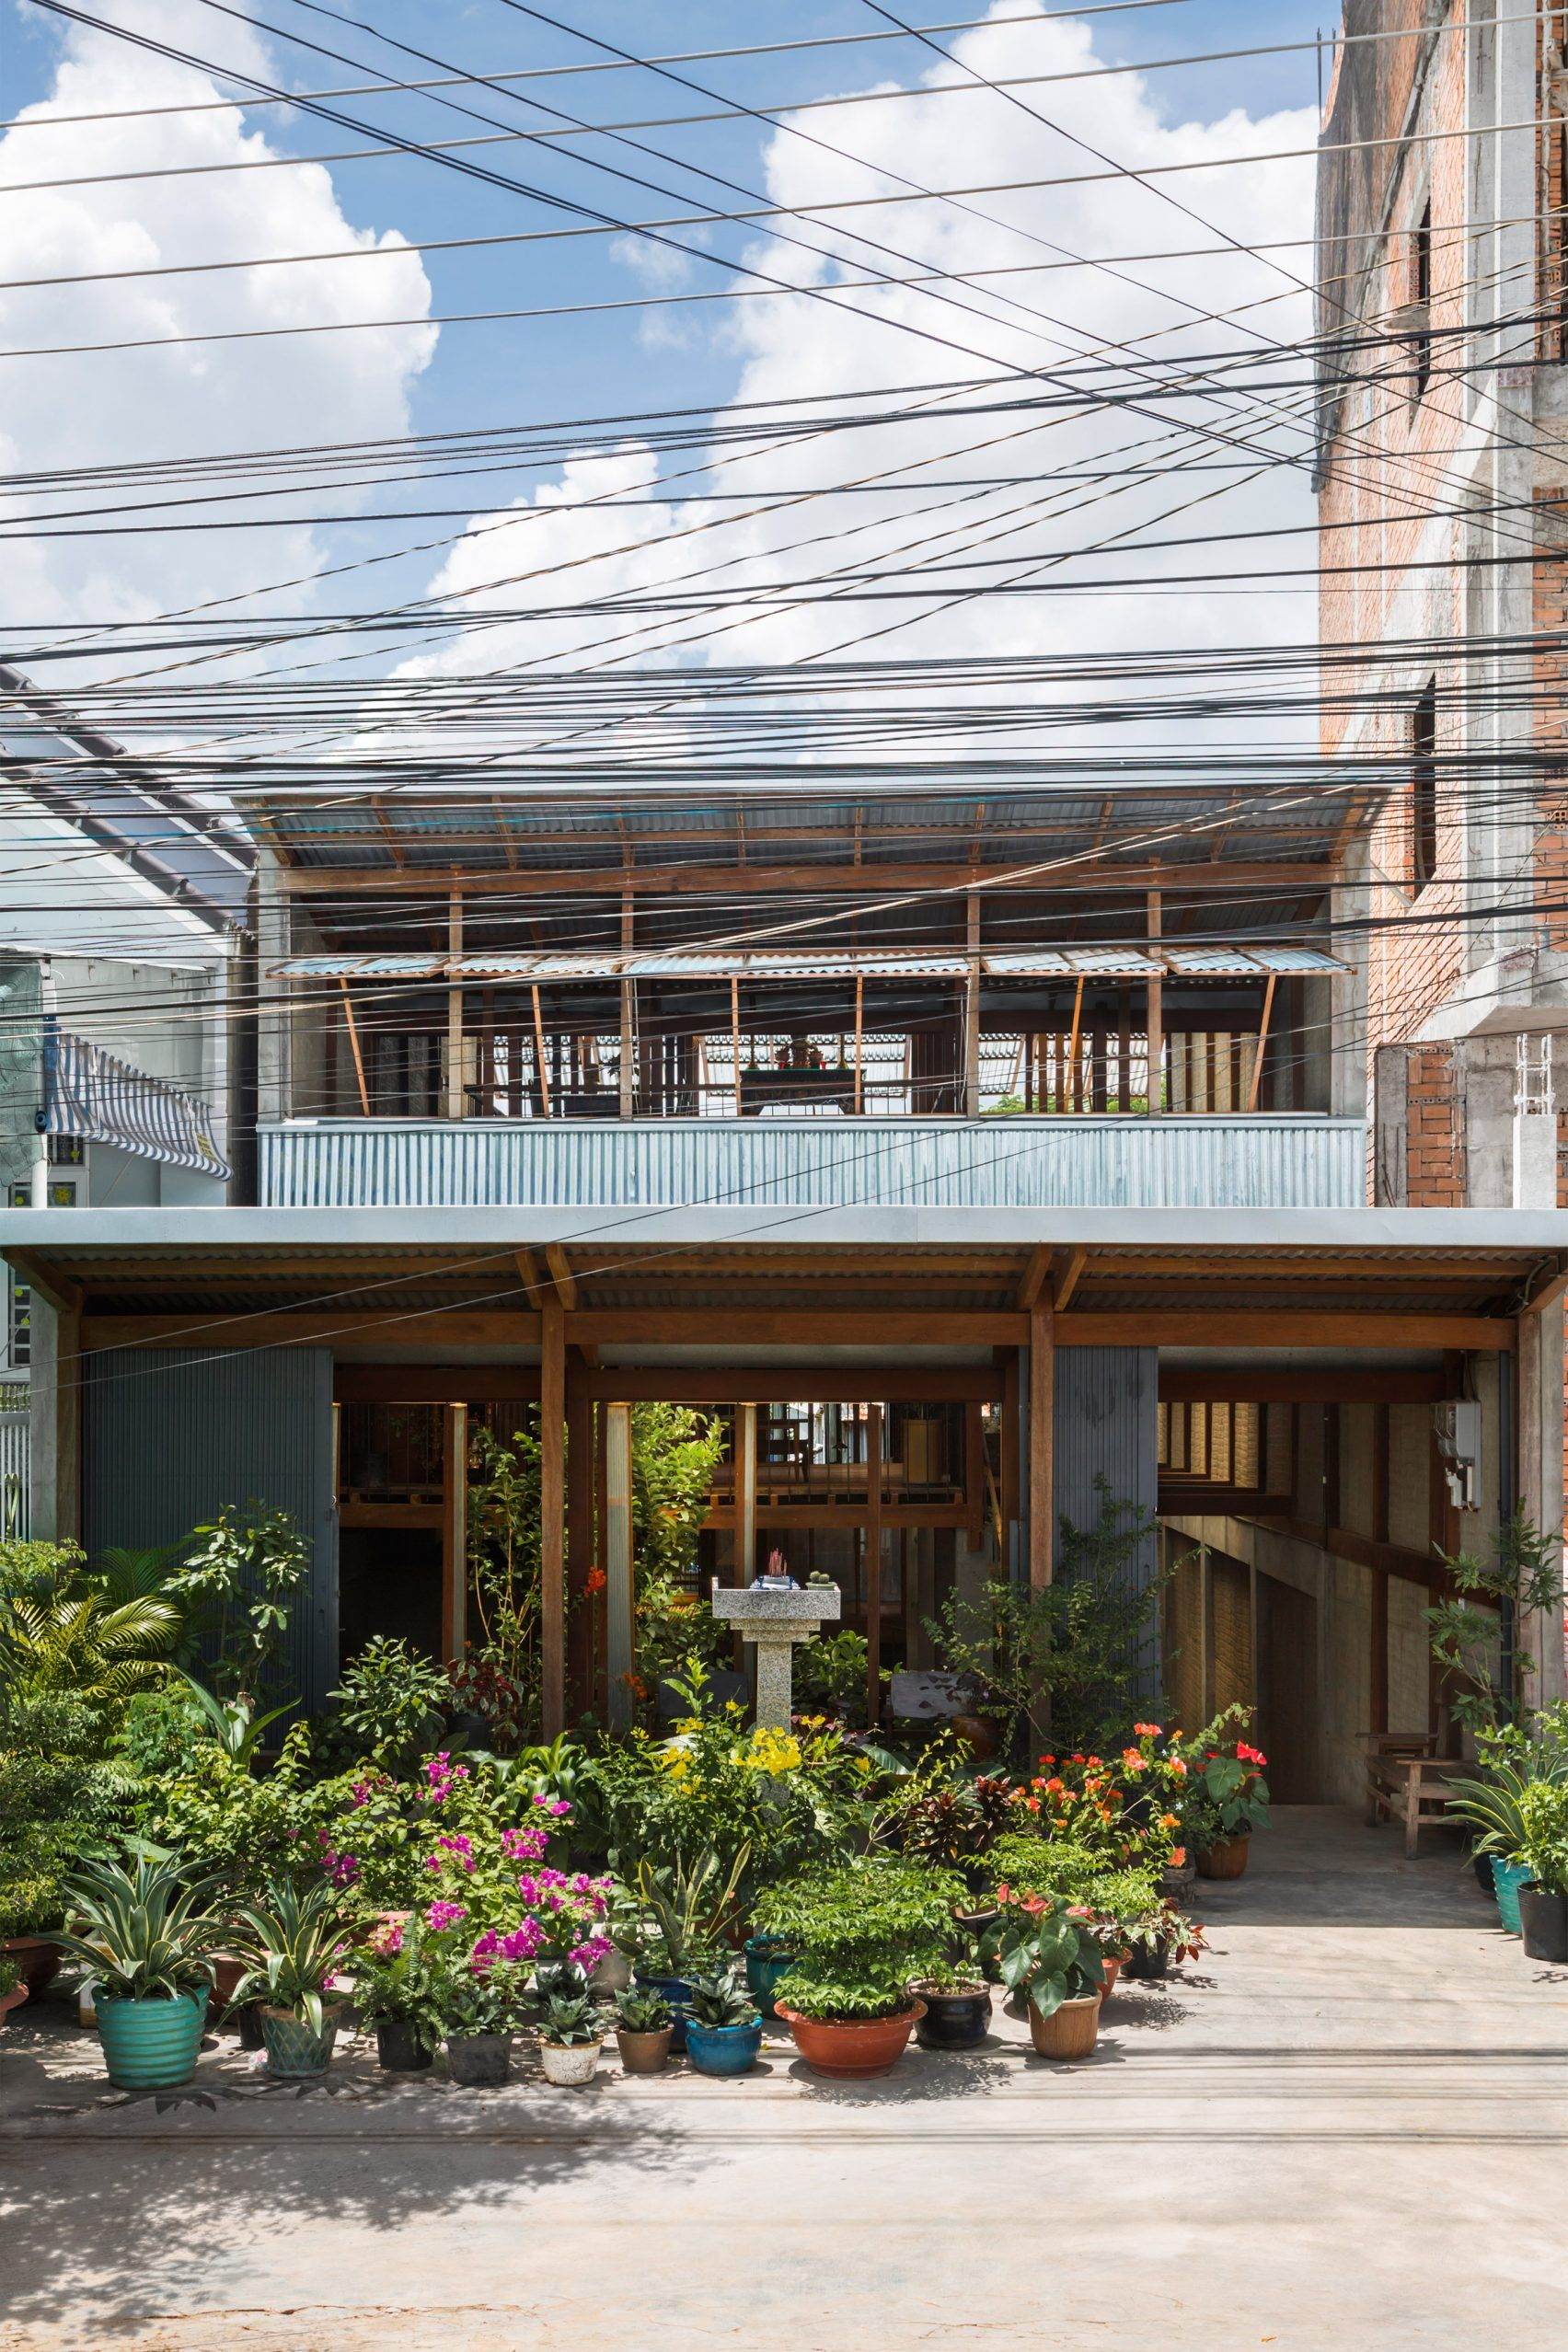 House Chau Doc Nishizawa Architects Architecture Residential Dezeen 2364 Col 0 1704x2556